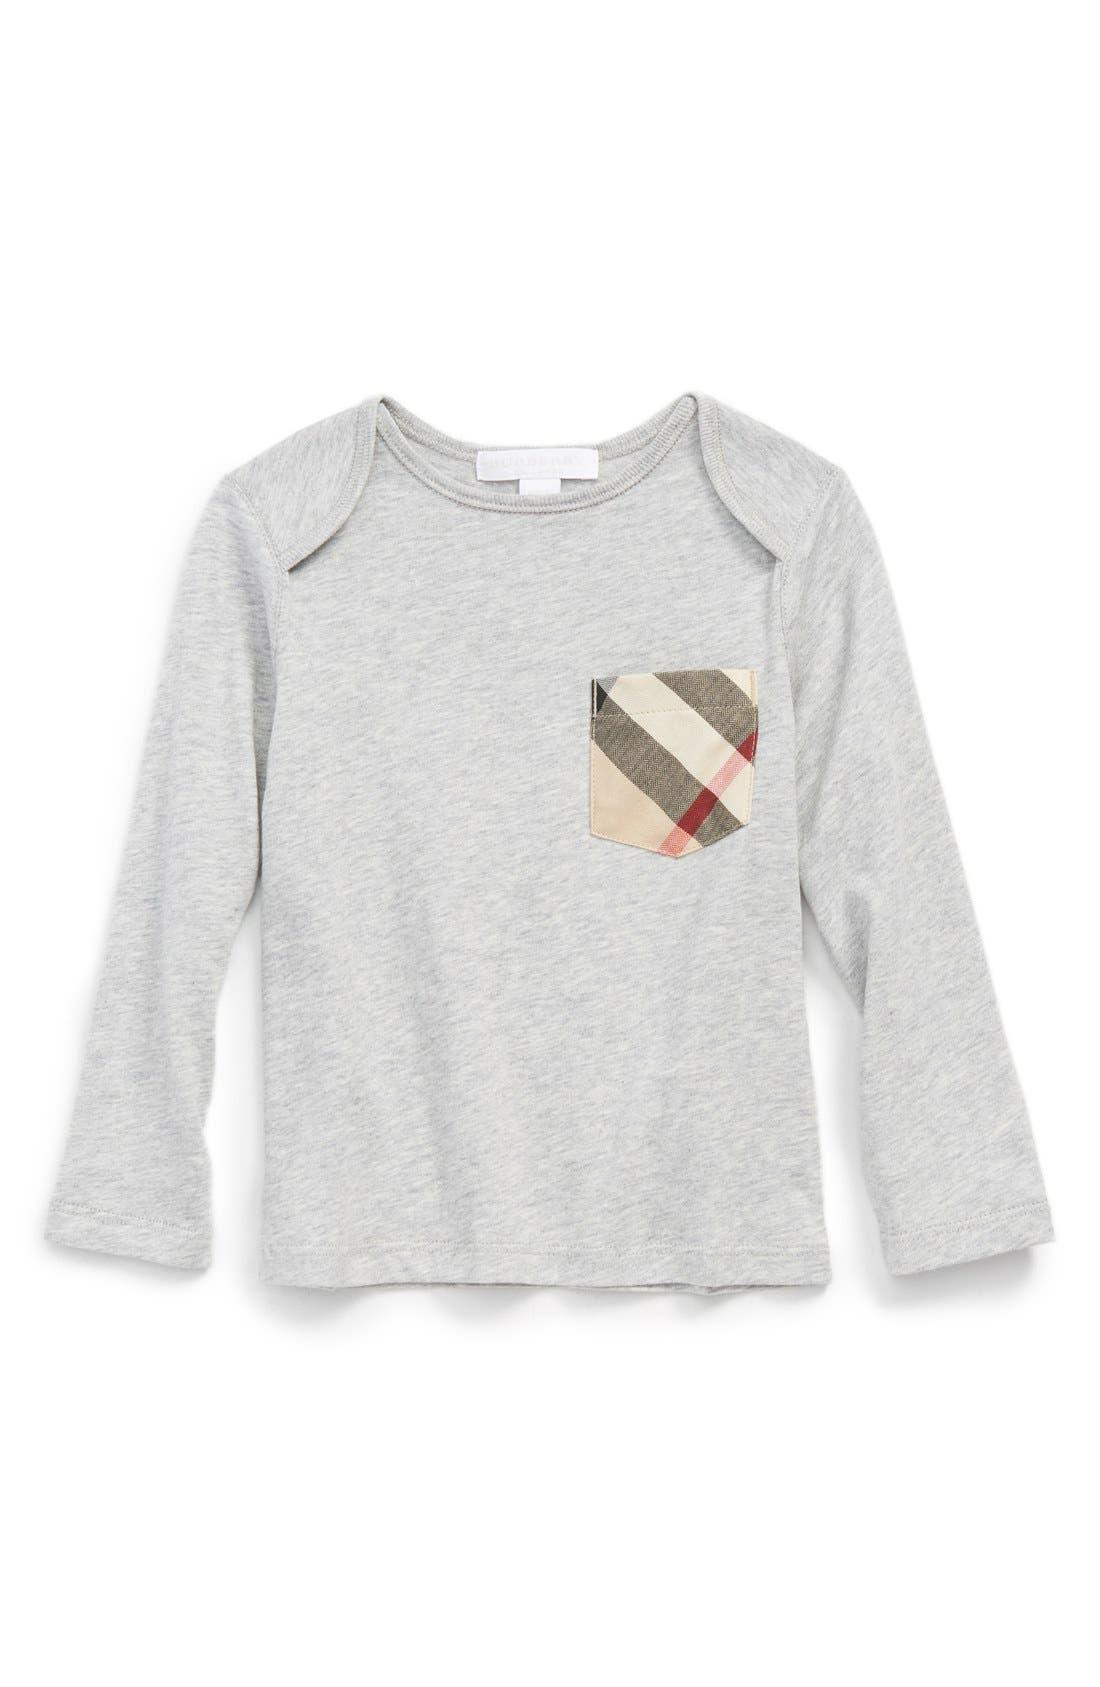 Burberry 'Callum' Check Print Chest Pocket T-Shirt (Baby Boys)